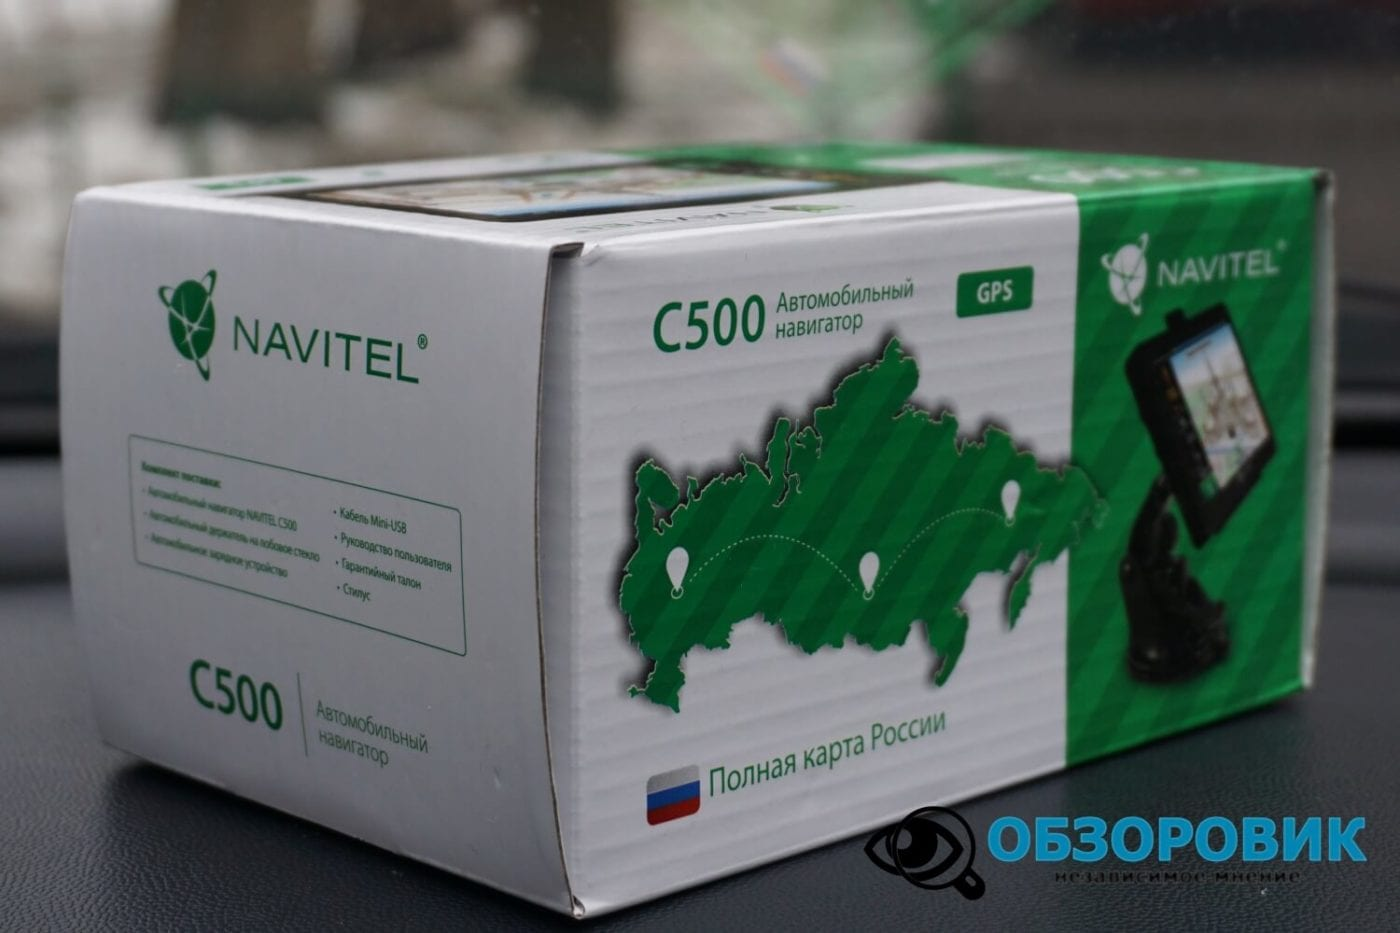 Обзор навигагора NAVITEL C500 3